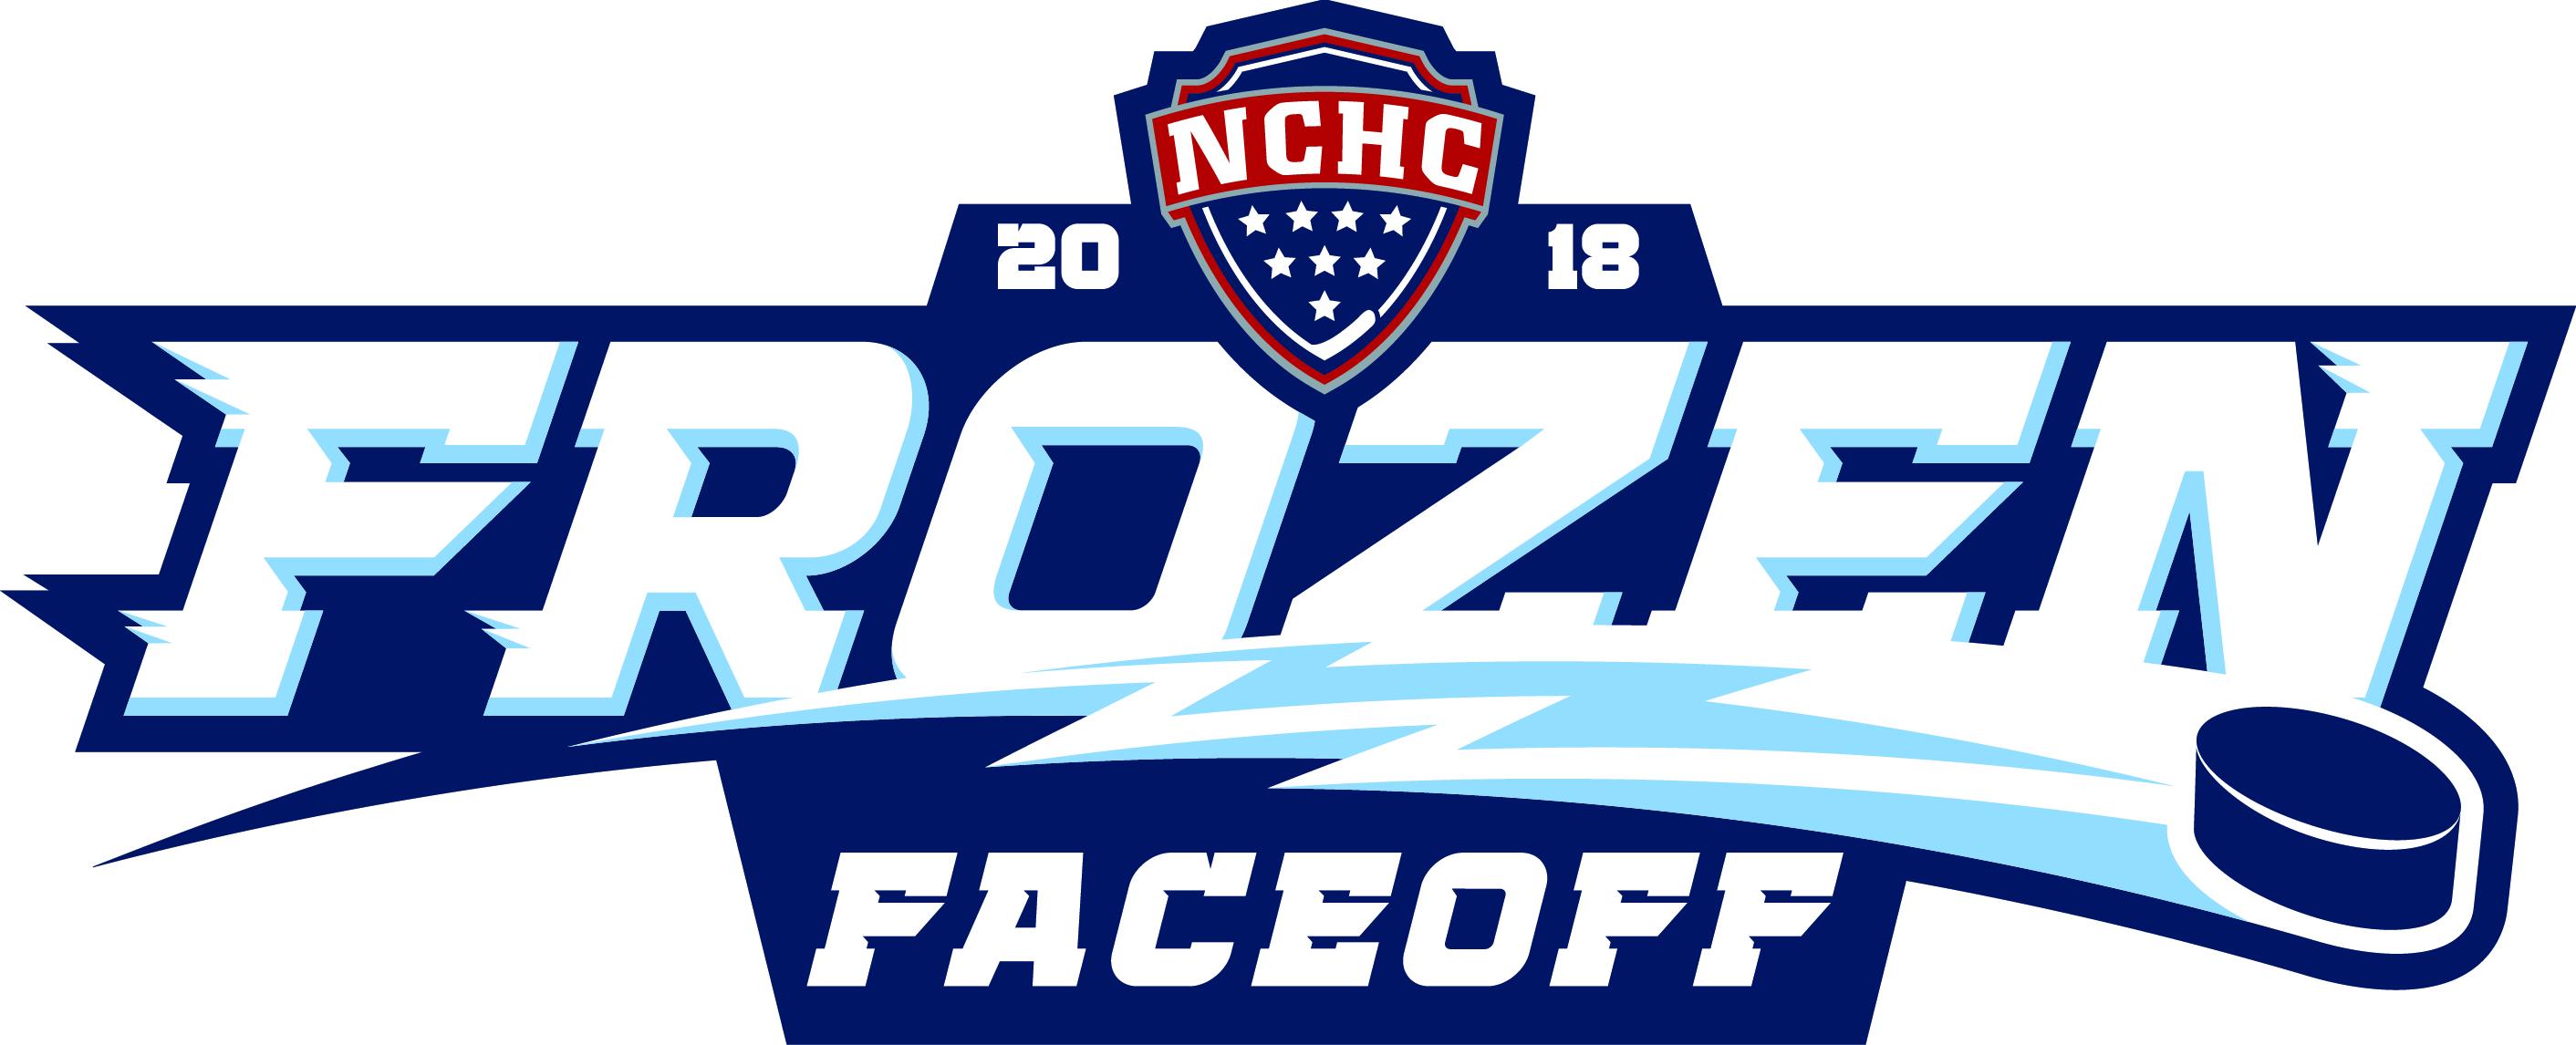 2018 NCHC Frozen Faceoff Wordmark_no dates.jpg